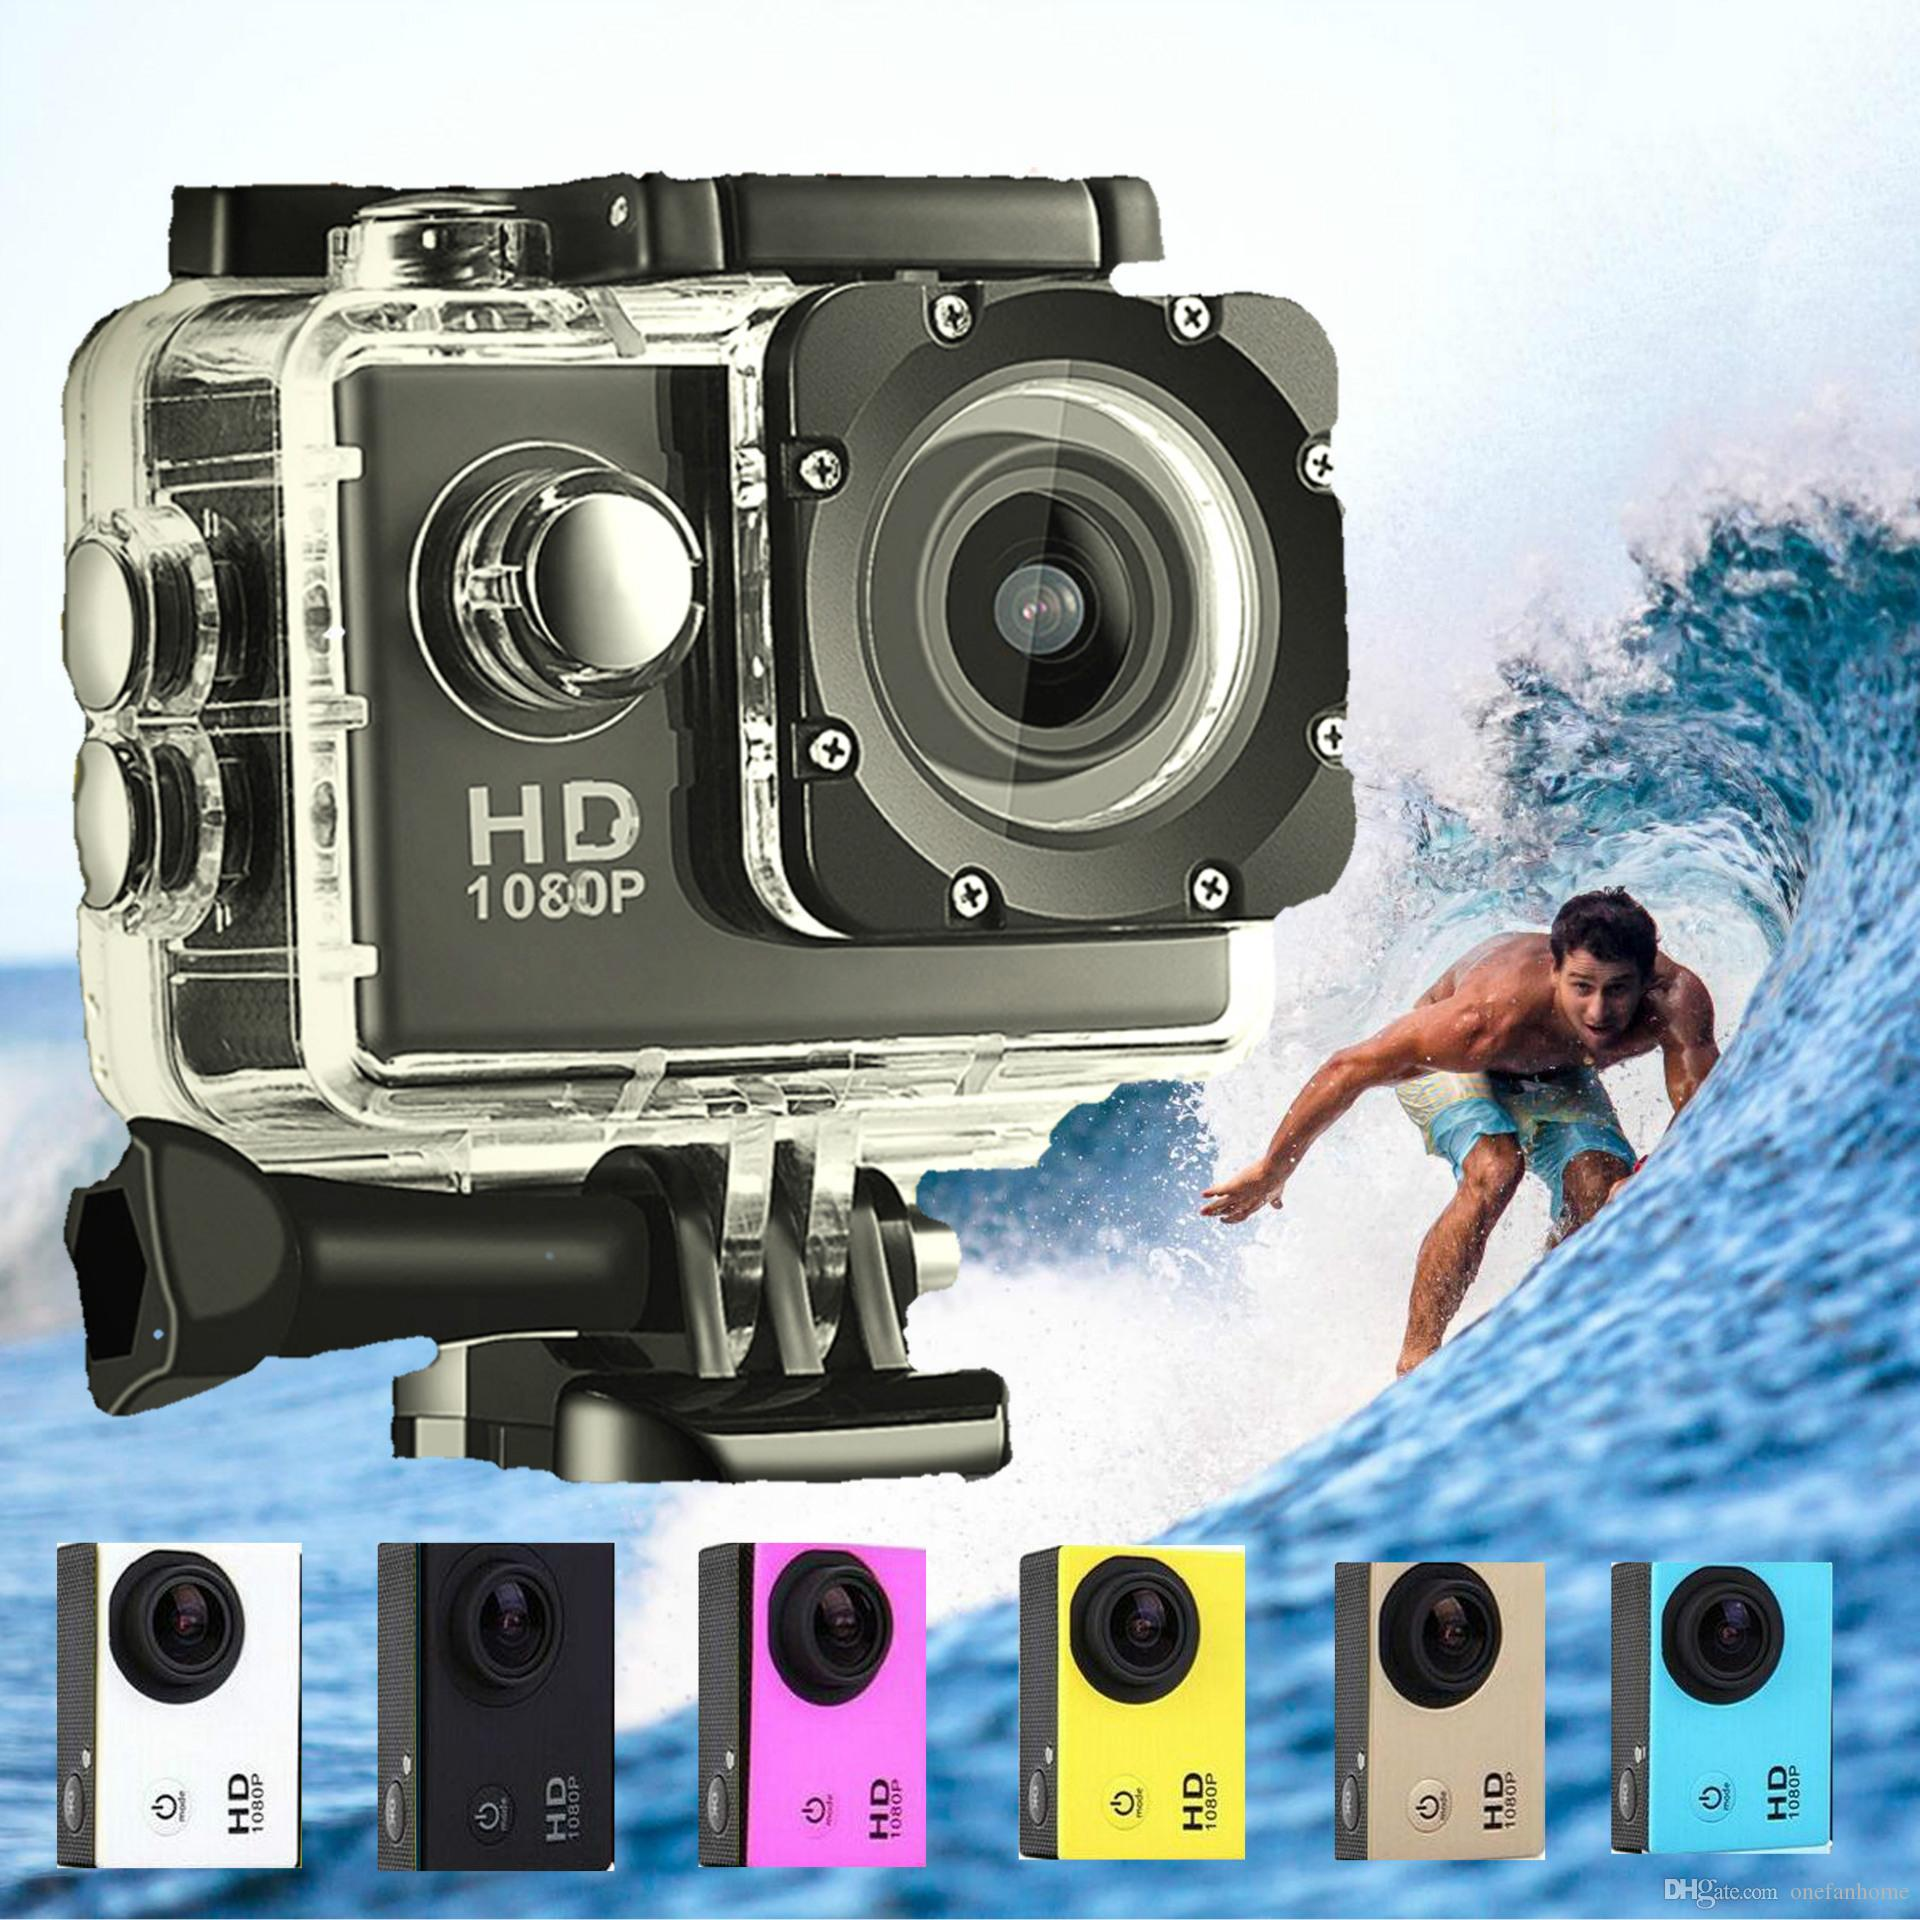 Waterproo A7 Sport Cam HD 1080P Helmet Sports DV Video Car Cam DV Action Waterproof Underwater 30M Camera Camcorder for Diving Surfing